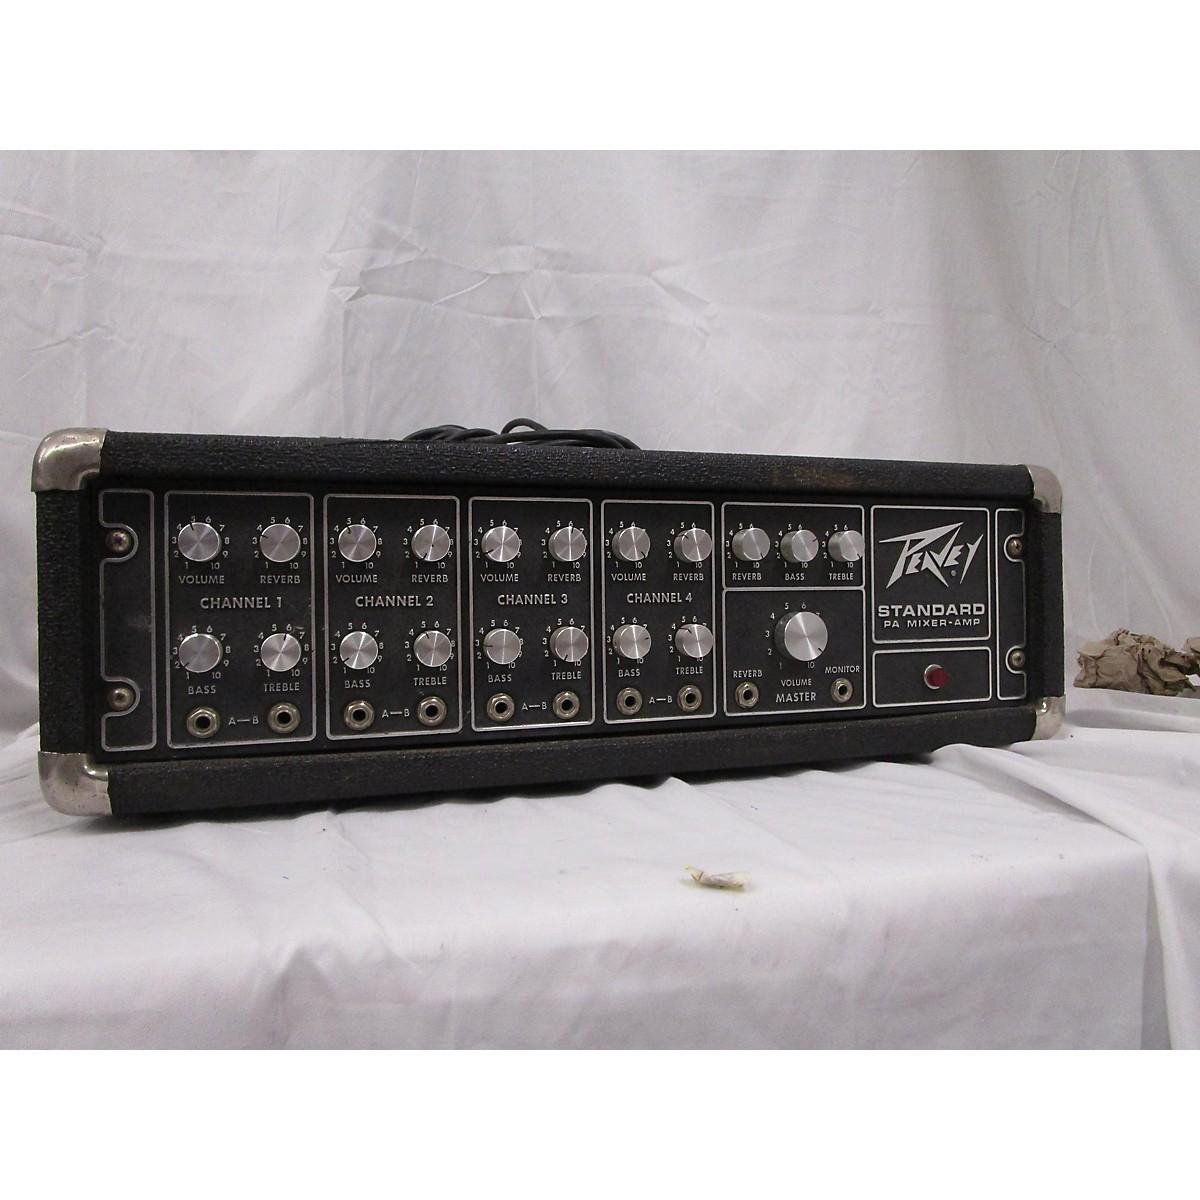 Peavey Series 260 Powered Mixer